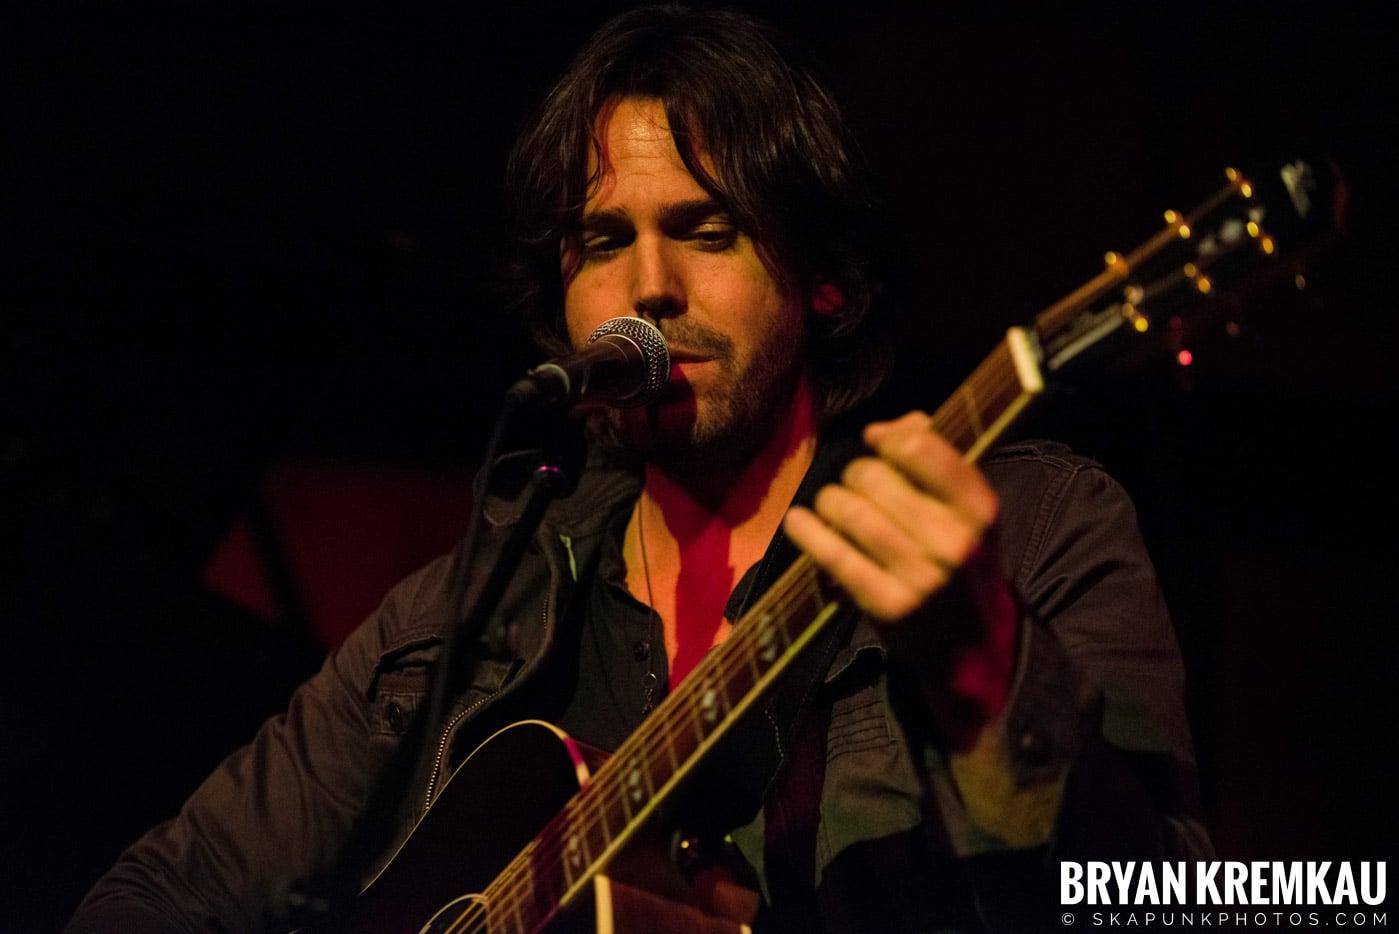 Peter Bradley Adams @ Rockwood Music Hall, NYC - 3.9.13 (15)